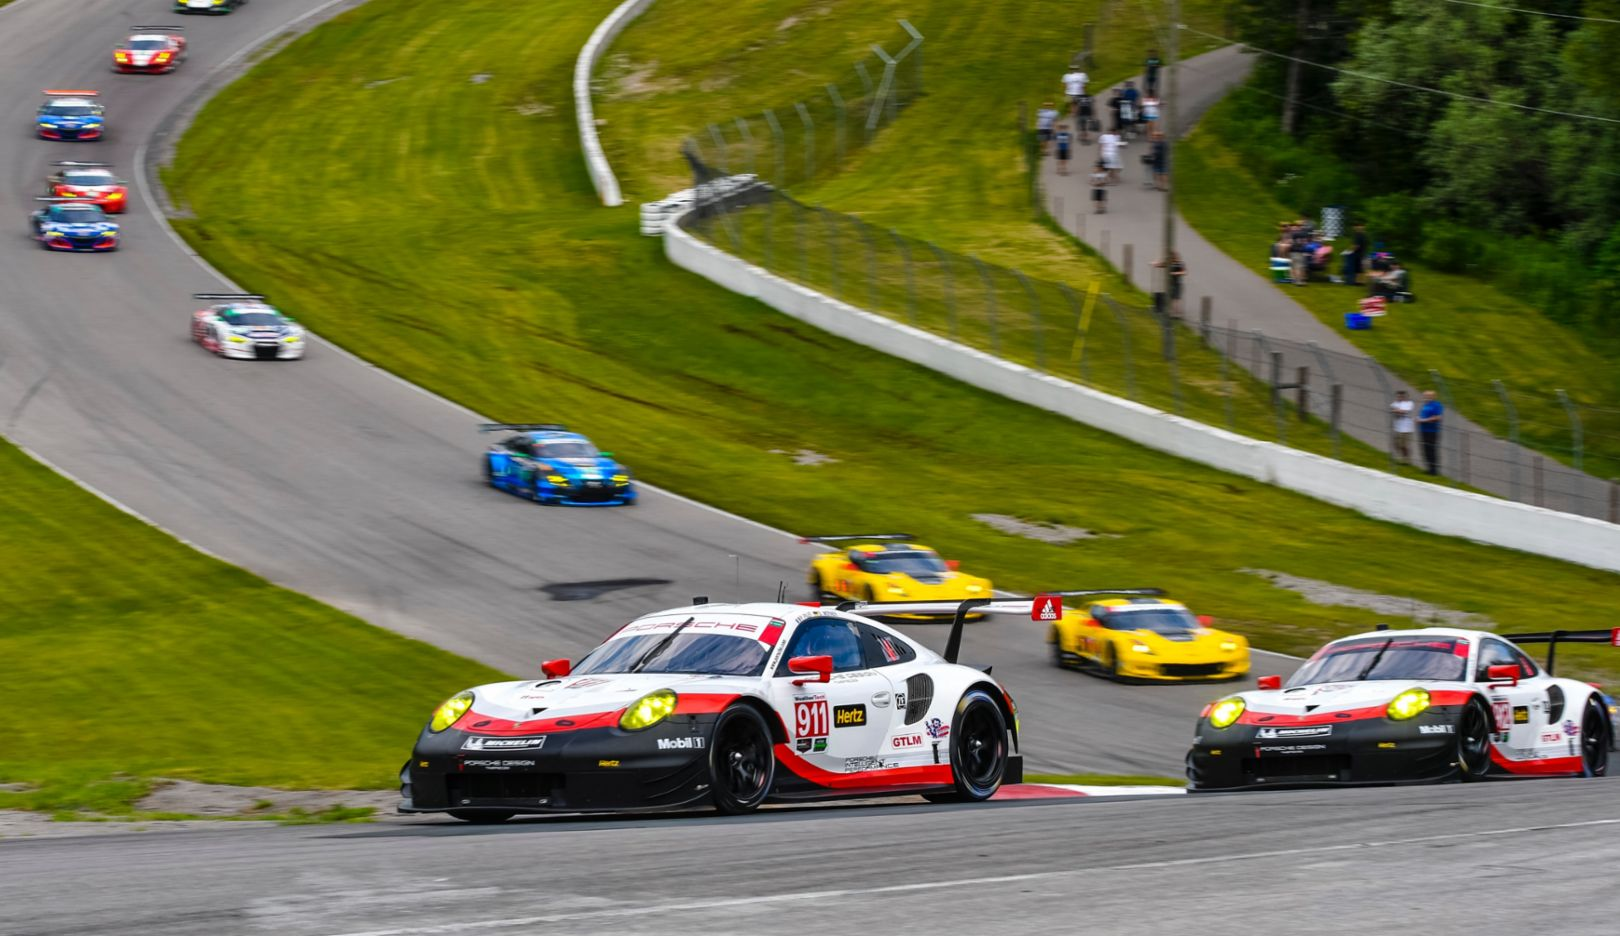 911 RSR, IMSA WeatherTech Sportscar Championship, Rennen, Bowmanville, Kanada, 2017, Porsche AG